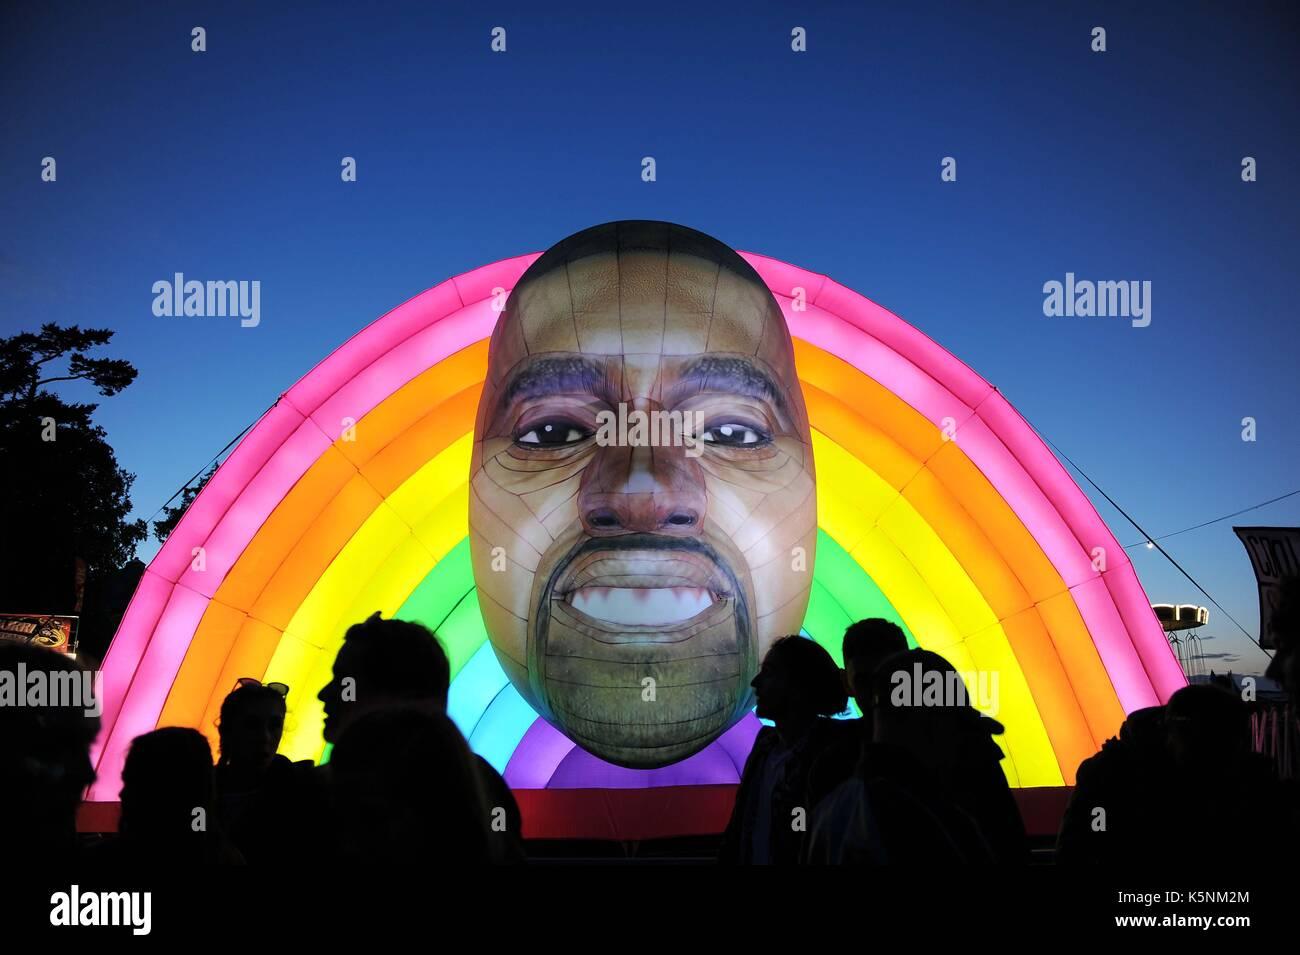 Aufblasbare Kanye West bei Bestival Music Festival. Aufblasbare Kanye West Quelle: Finnbarr Webster/Alamy leben Stockfoto